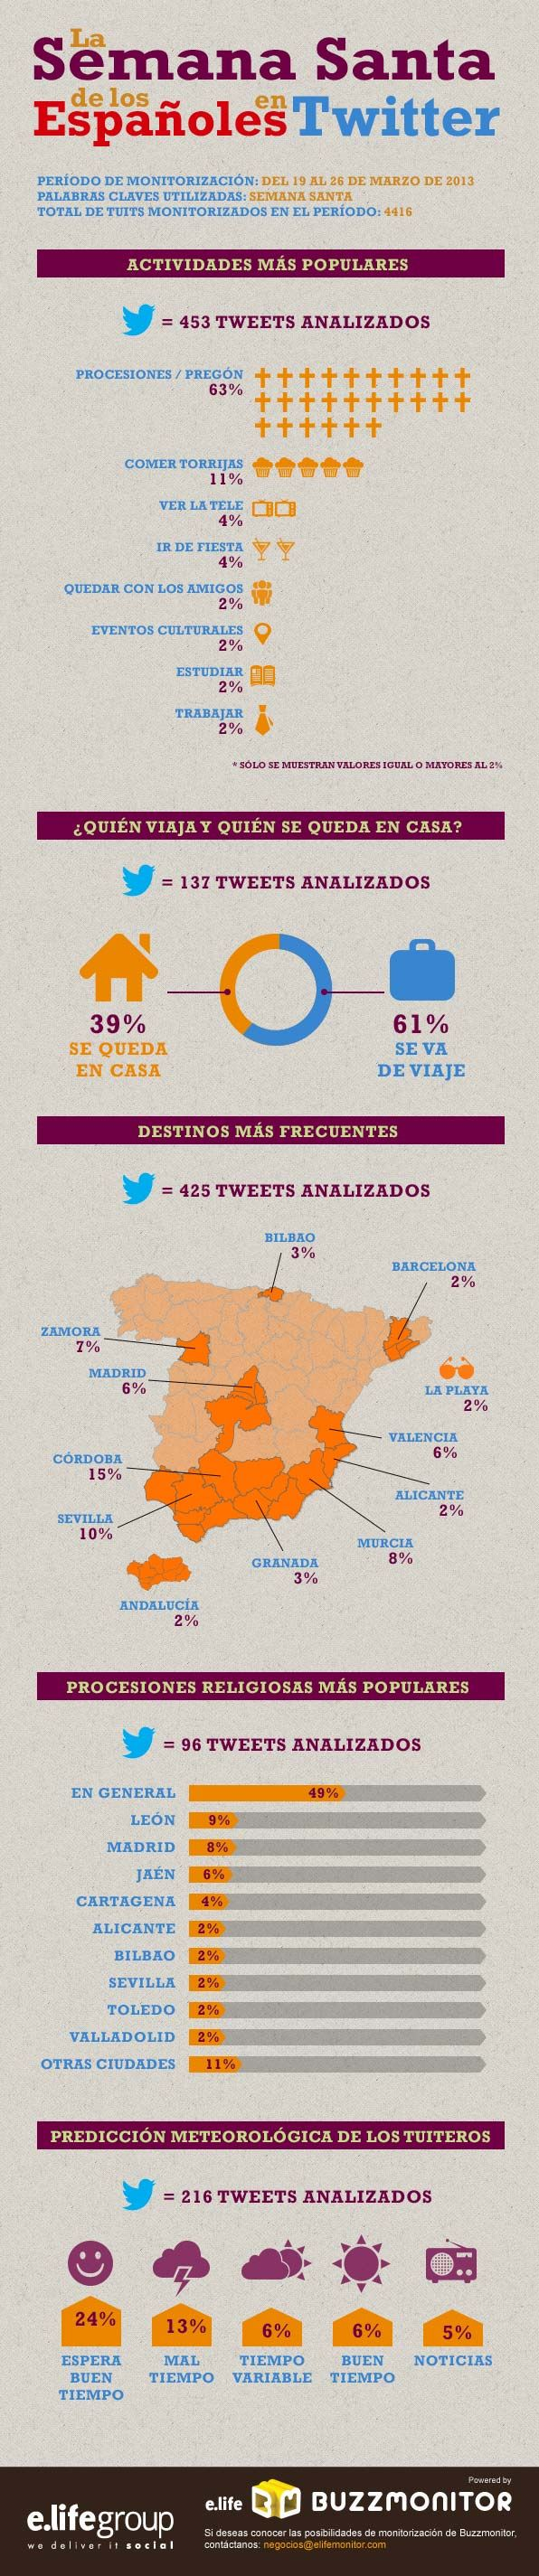 La Semana Santa de los españoles en Twitter #infografia